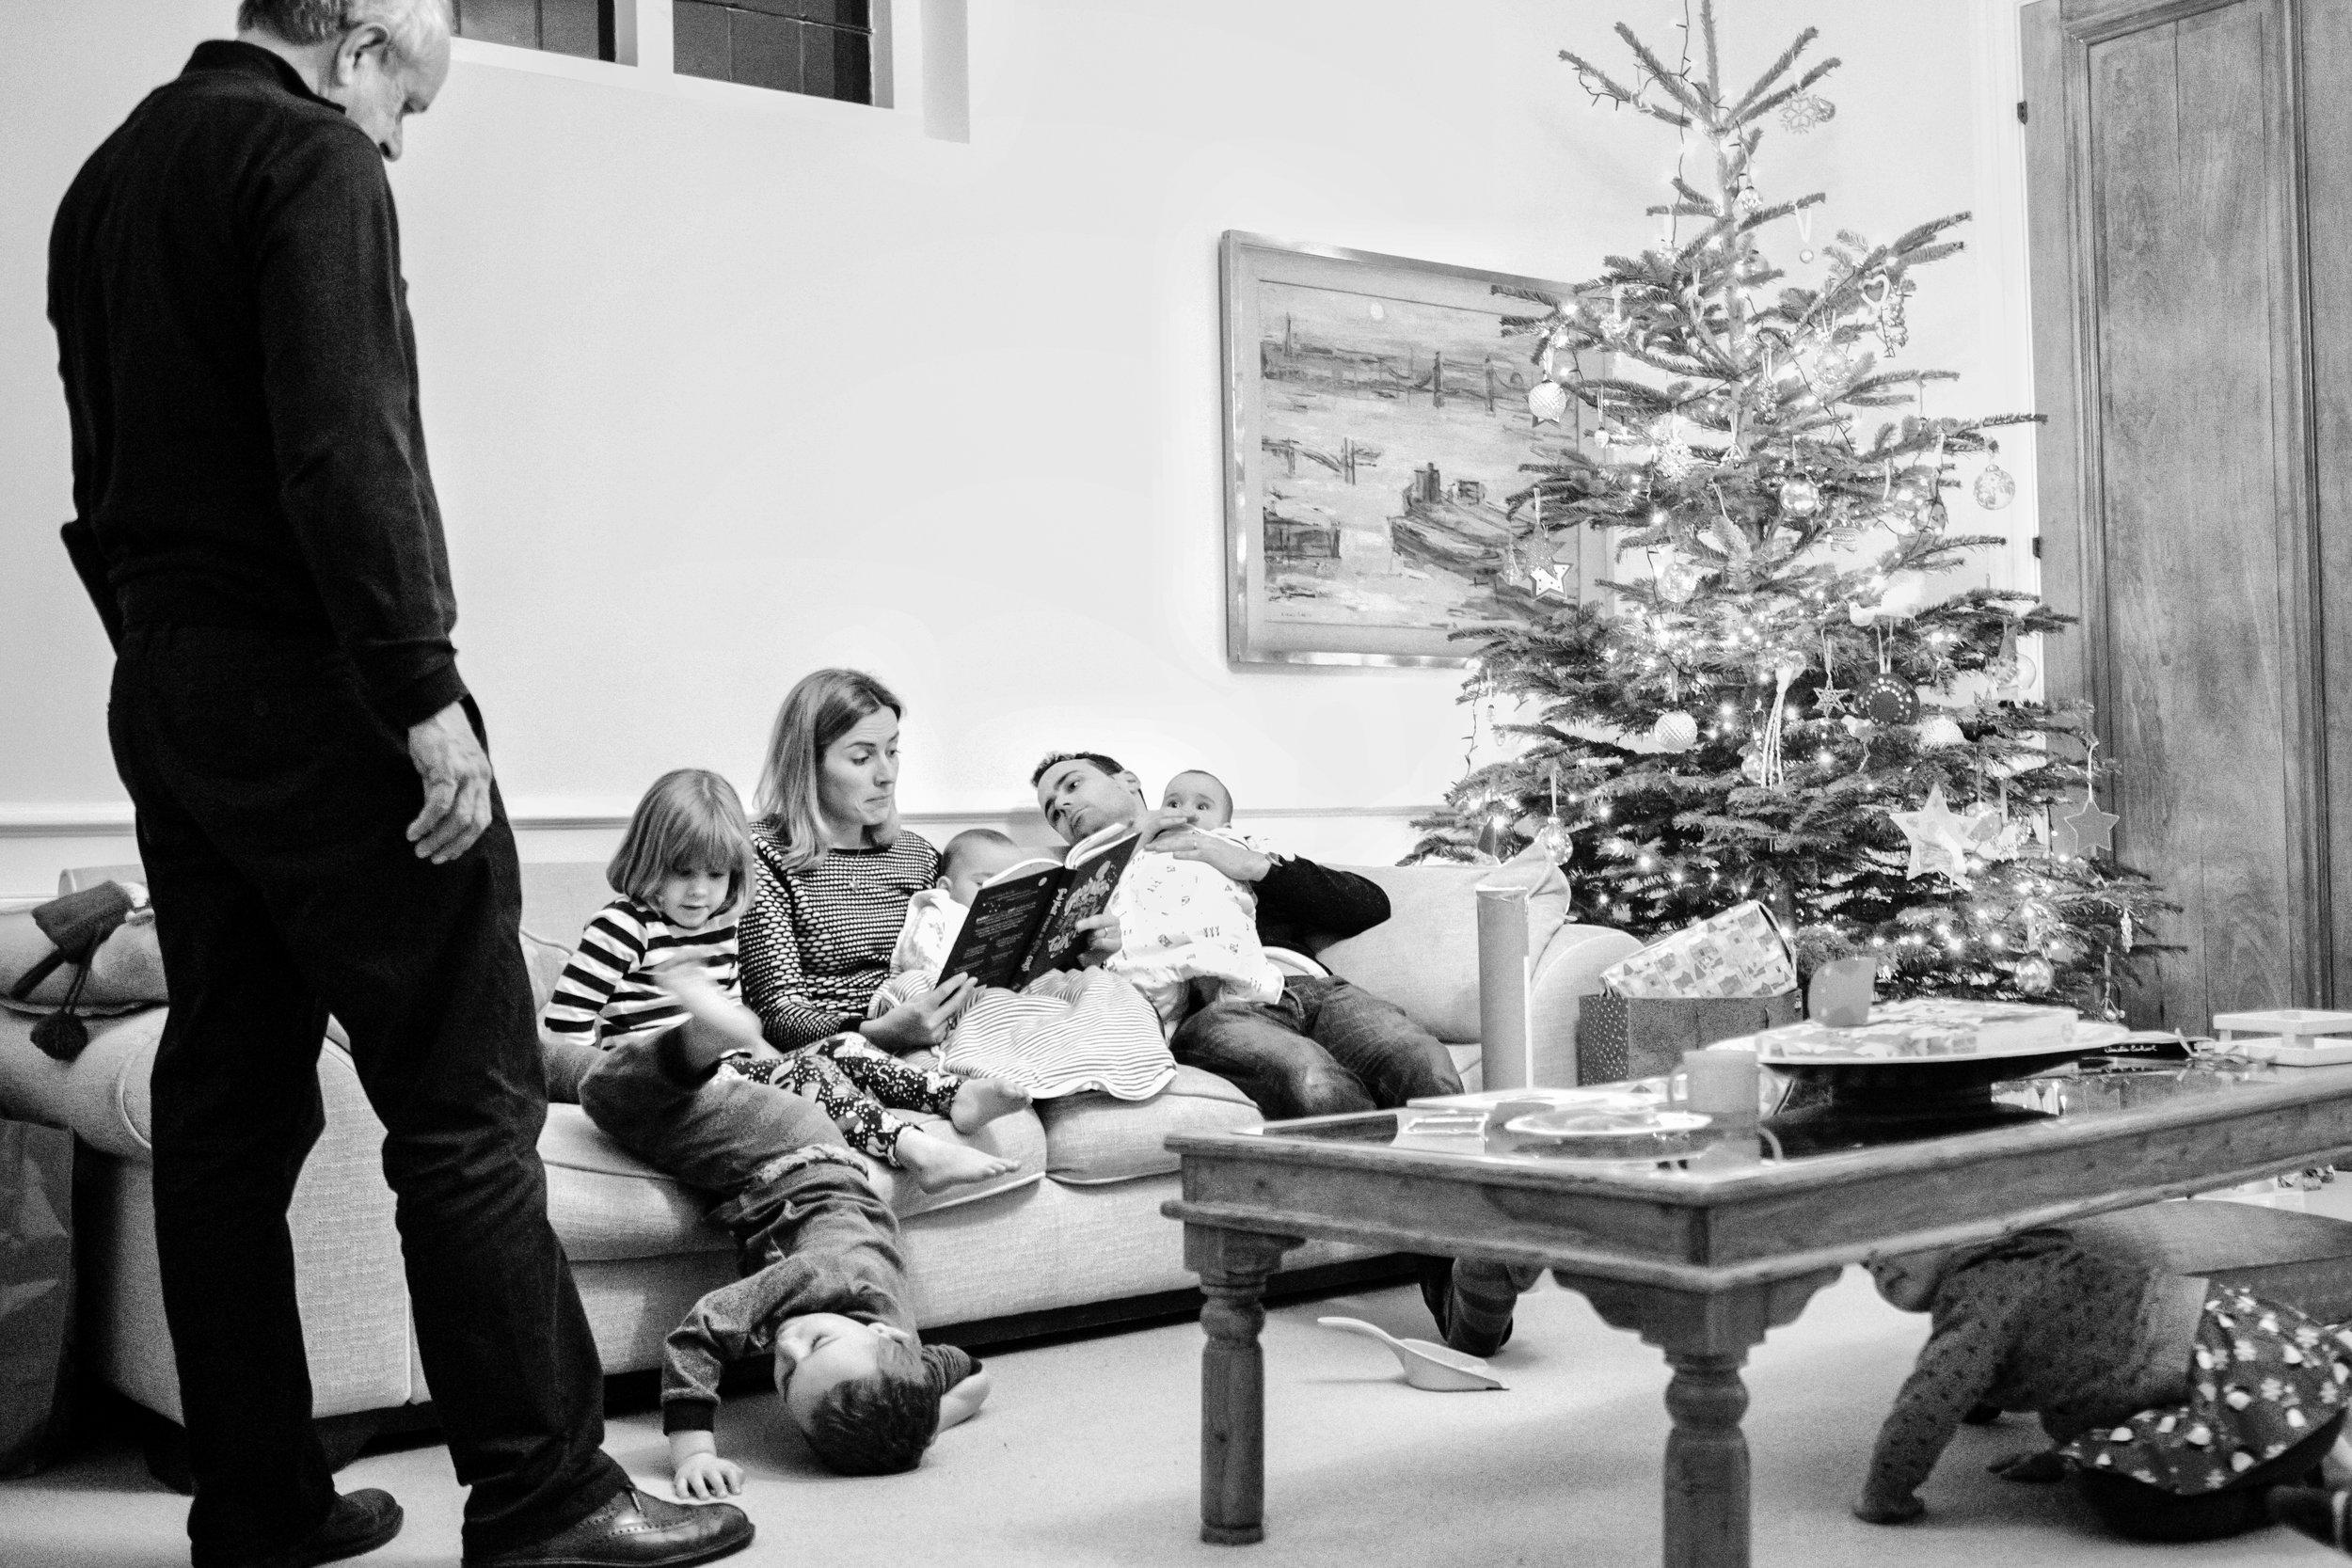 Katie-Collins-Christmas-pictures80-5.jpg